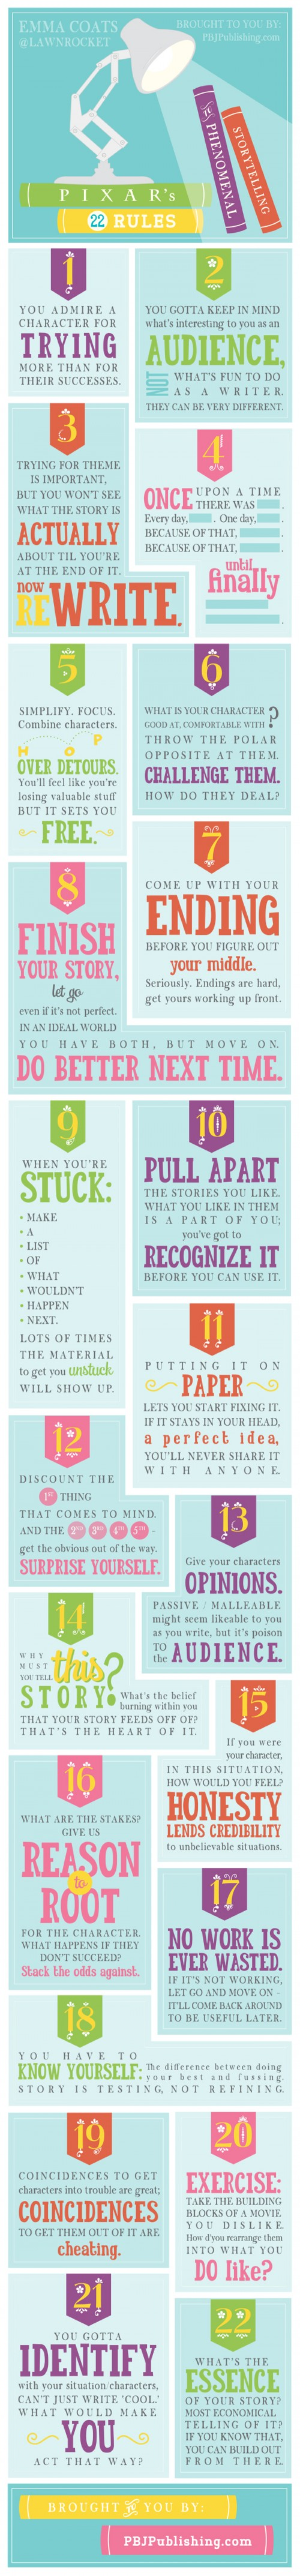 Pixar-22-rules-to-phenomenal-storytelling1-e1341853885426